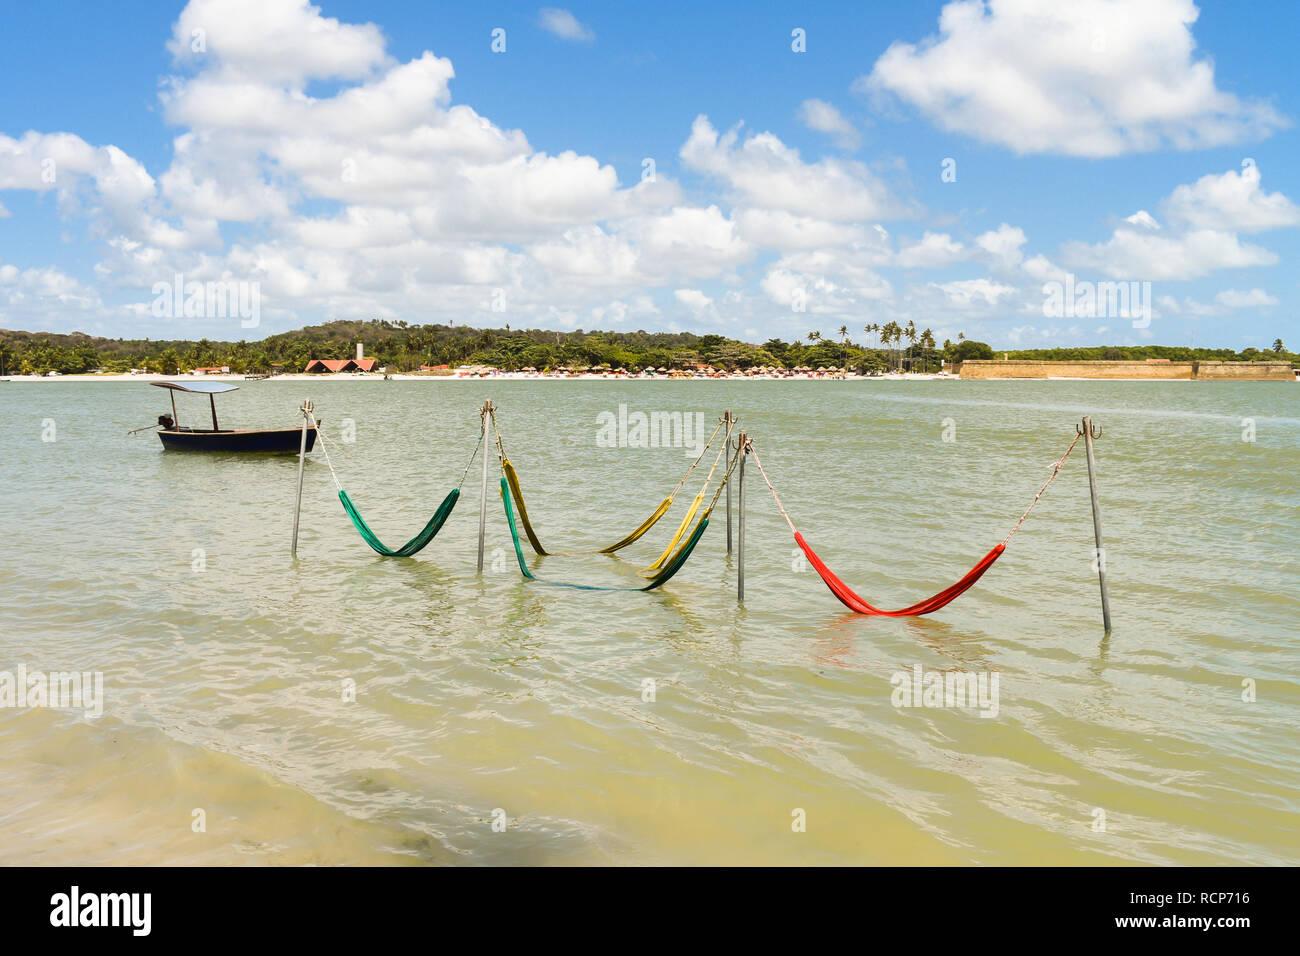 Hammocks in the ocean, by the shore of Coroa do Aviao islet - popular tourist destination in the north coast of Pernambuco - Stock Image